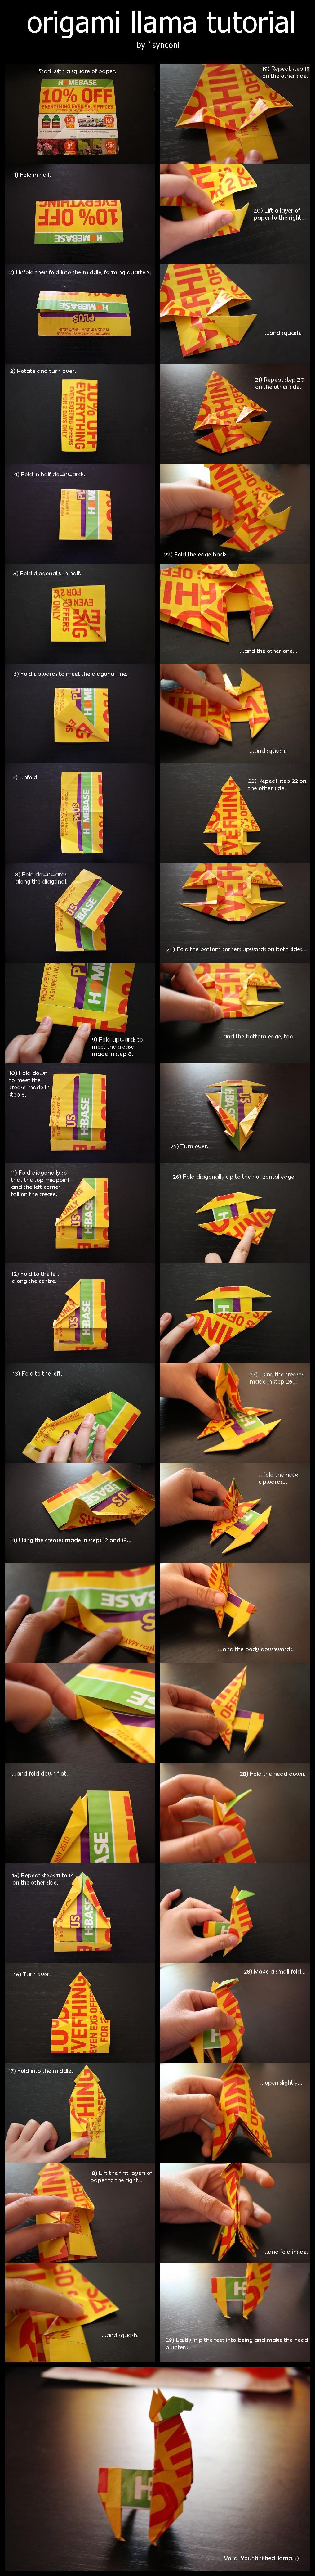 Origami Llama Tutorial By Synconi On Deviantart Art Pinterest